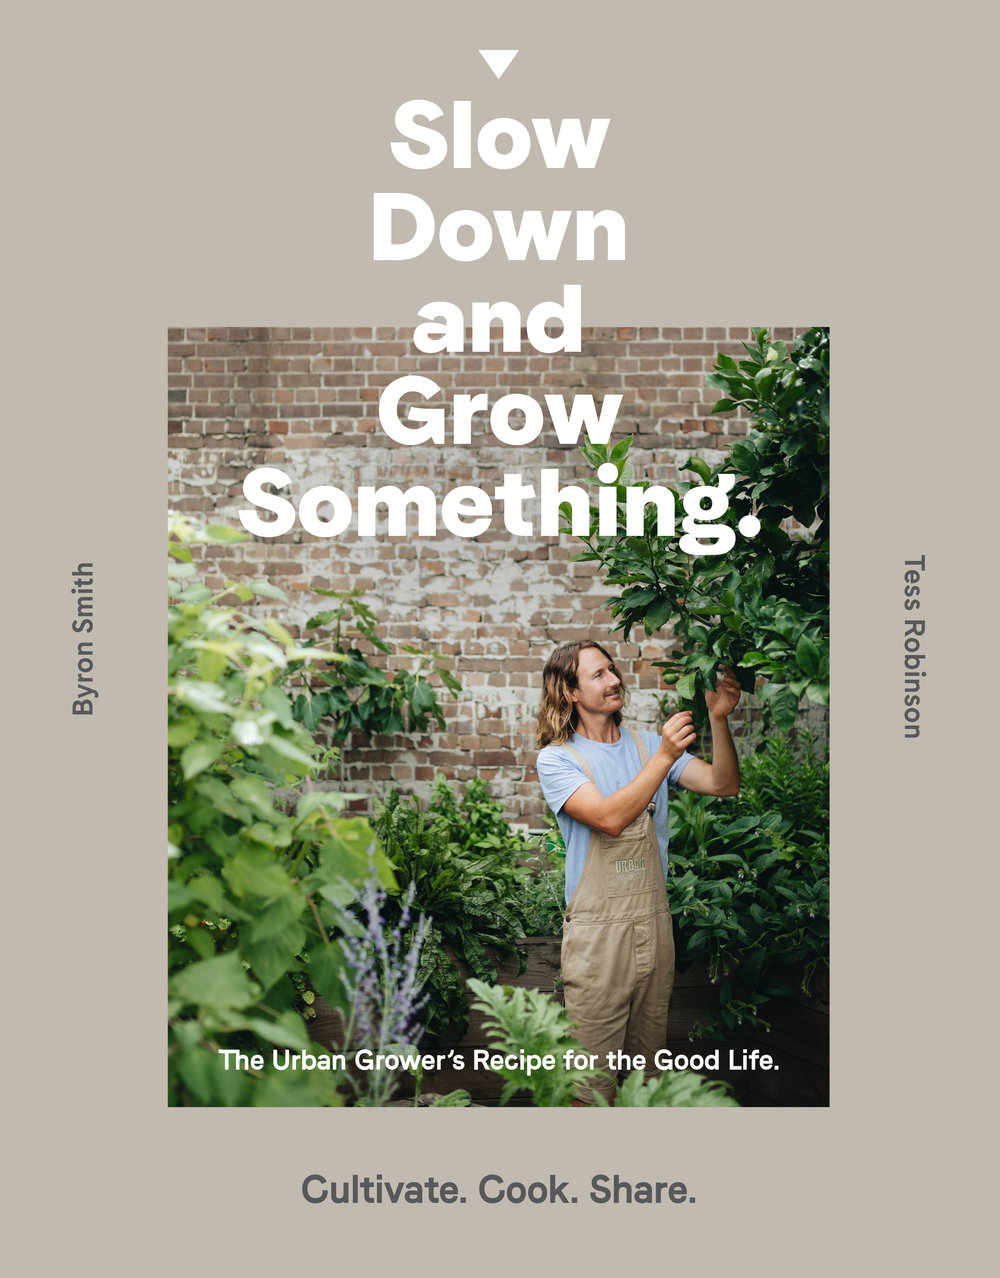 CADABBRA.COM.AU_#54_Happy_Valley_Slow_Down_and_Grow_Something_1slow-down-and-grow-something_1.jpg